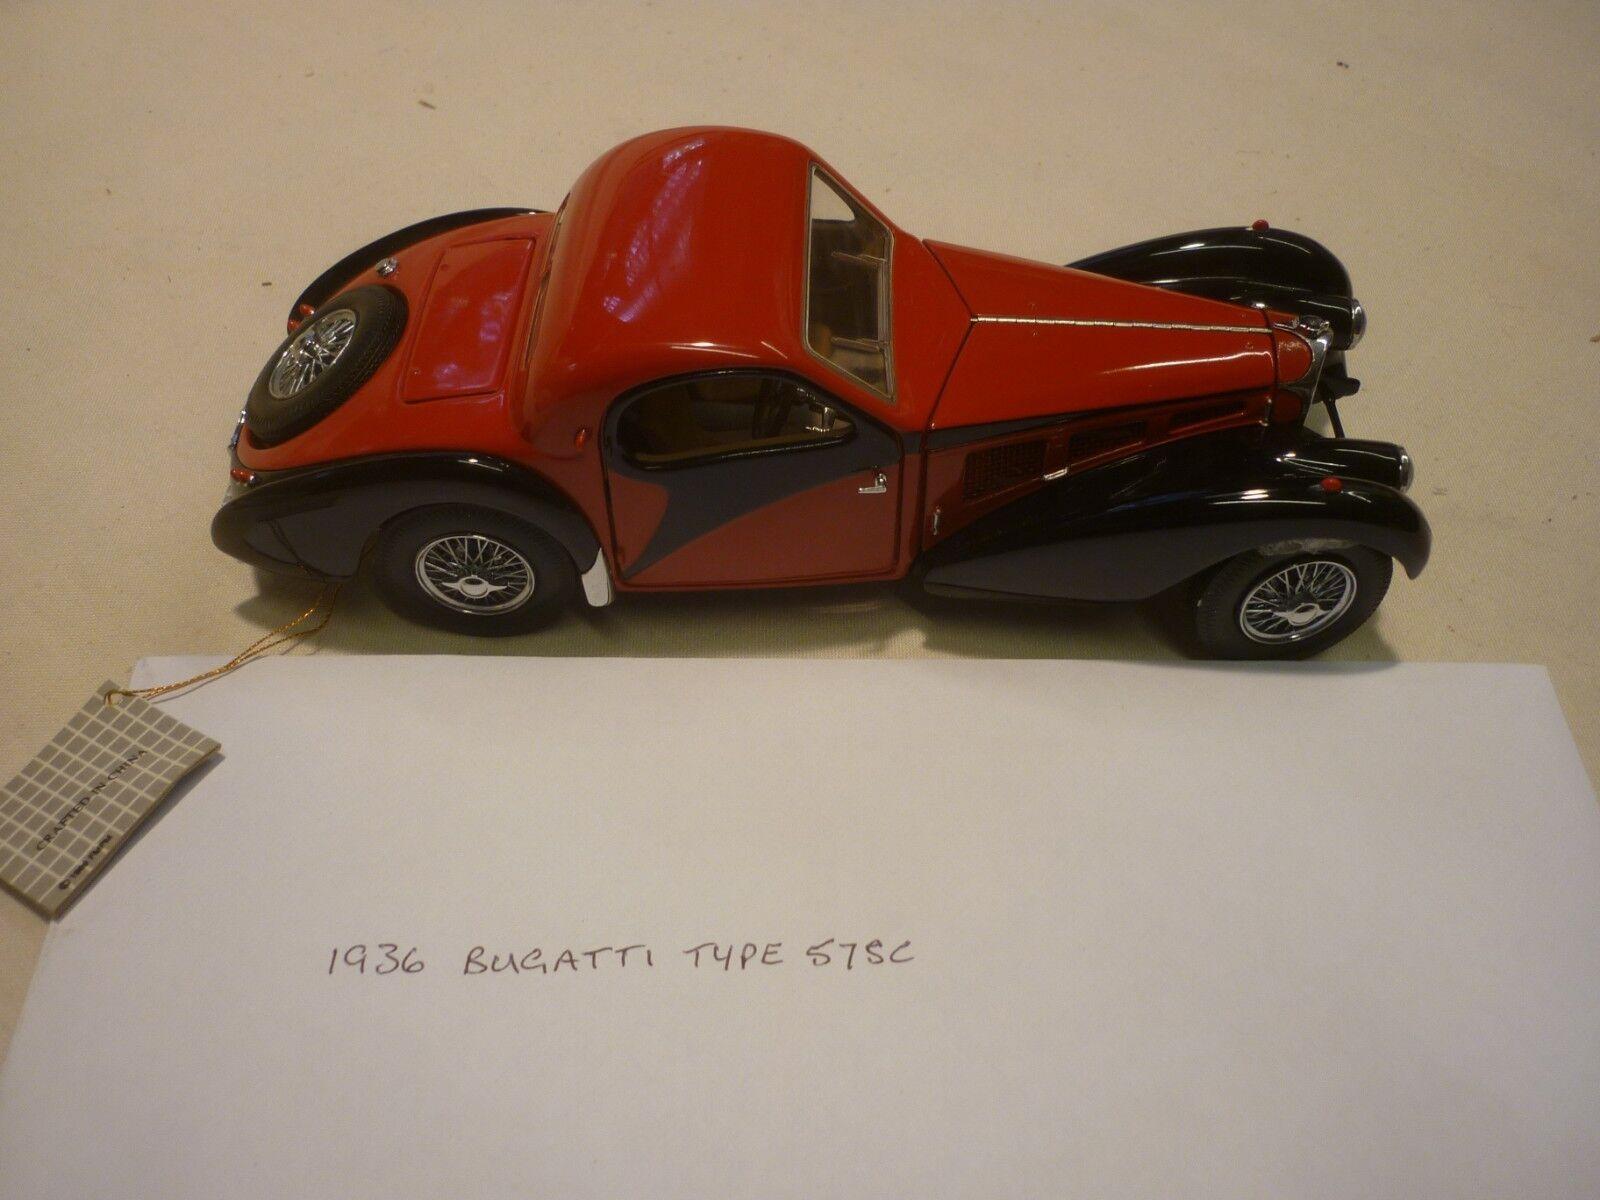 Un Franklin Comme neuf scale model of a 1936 Bugatti Type 57SC. Boxed, papiers